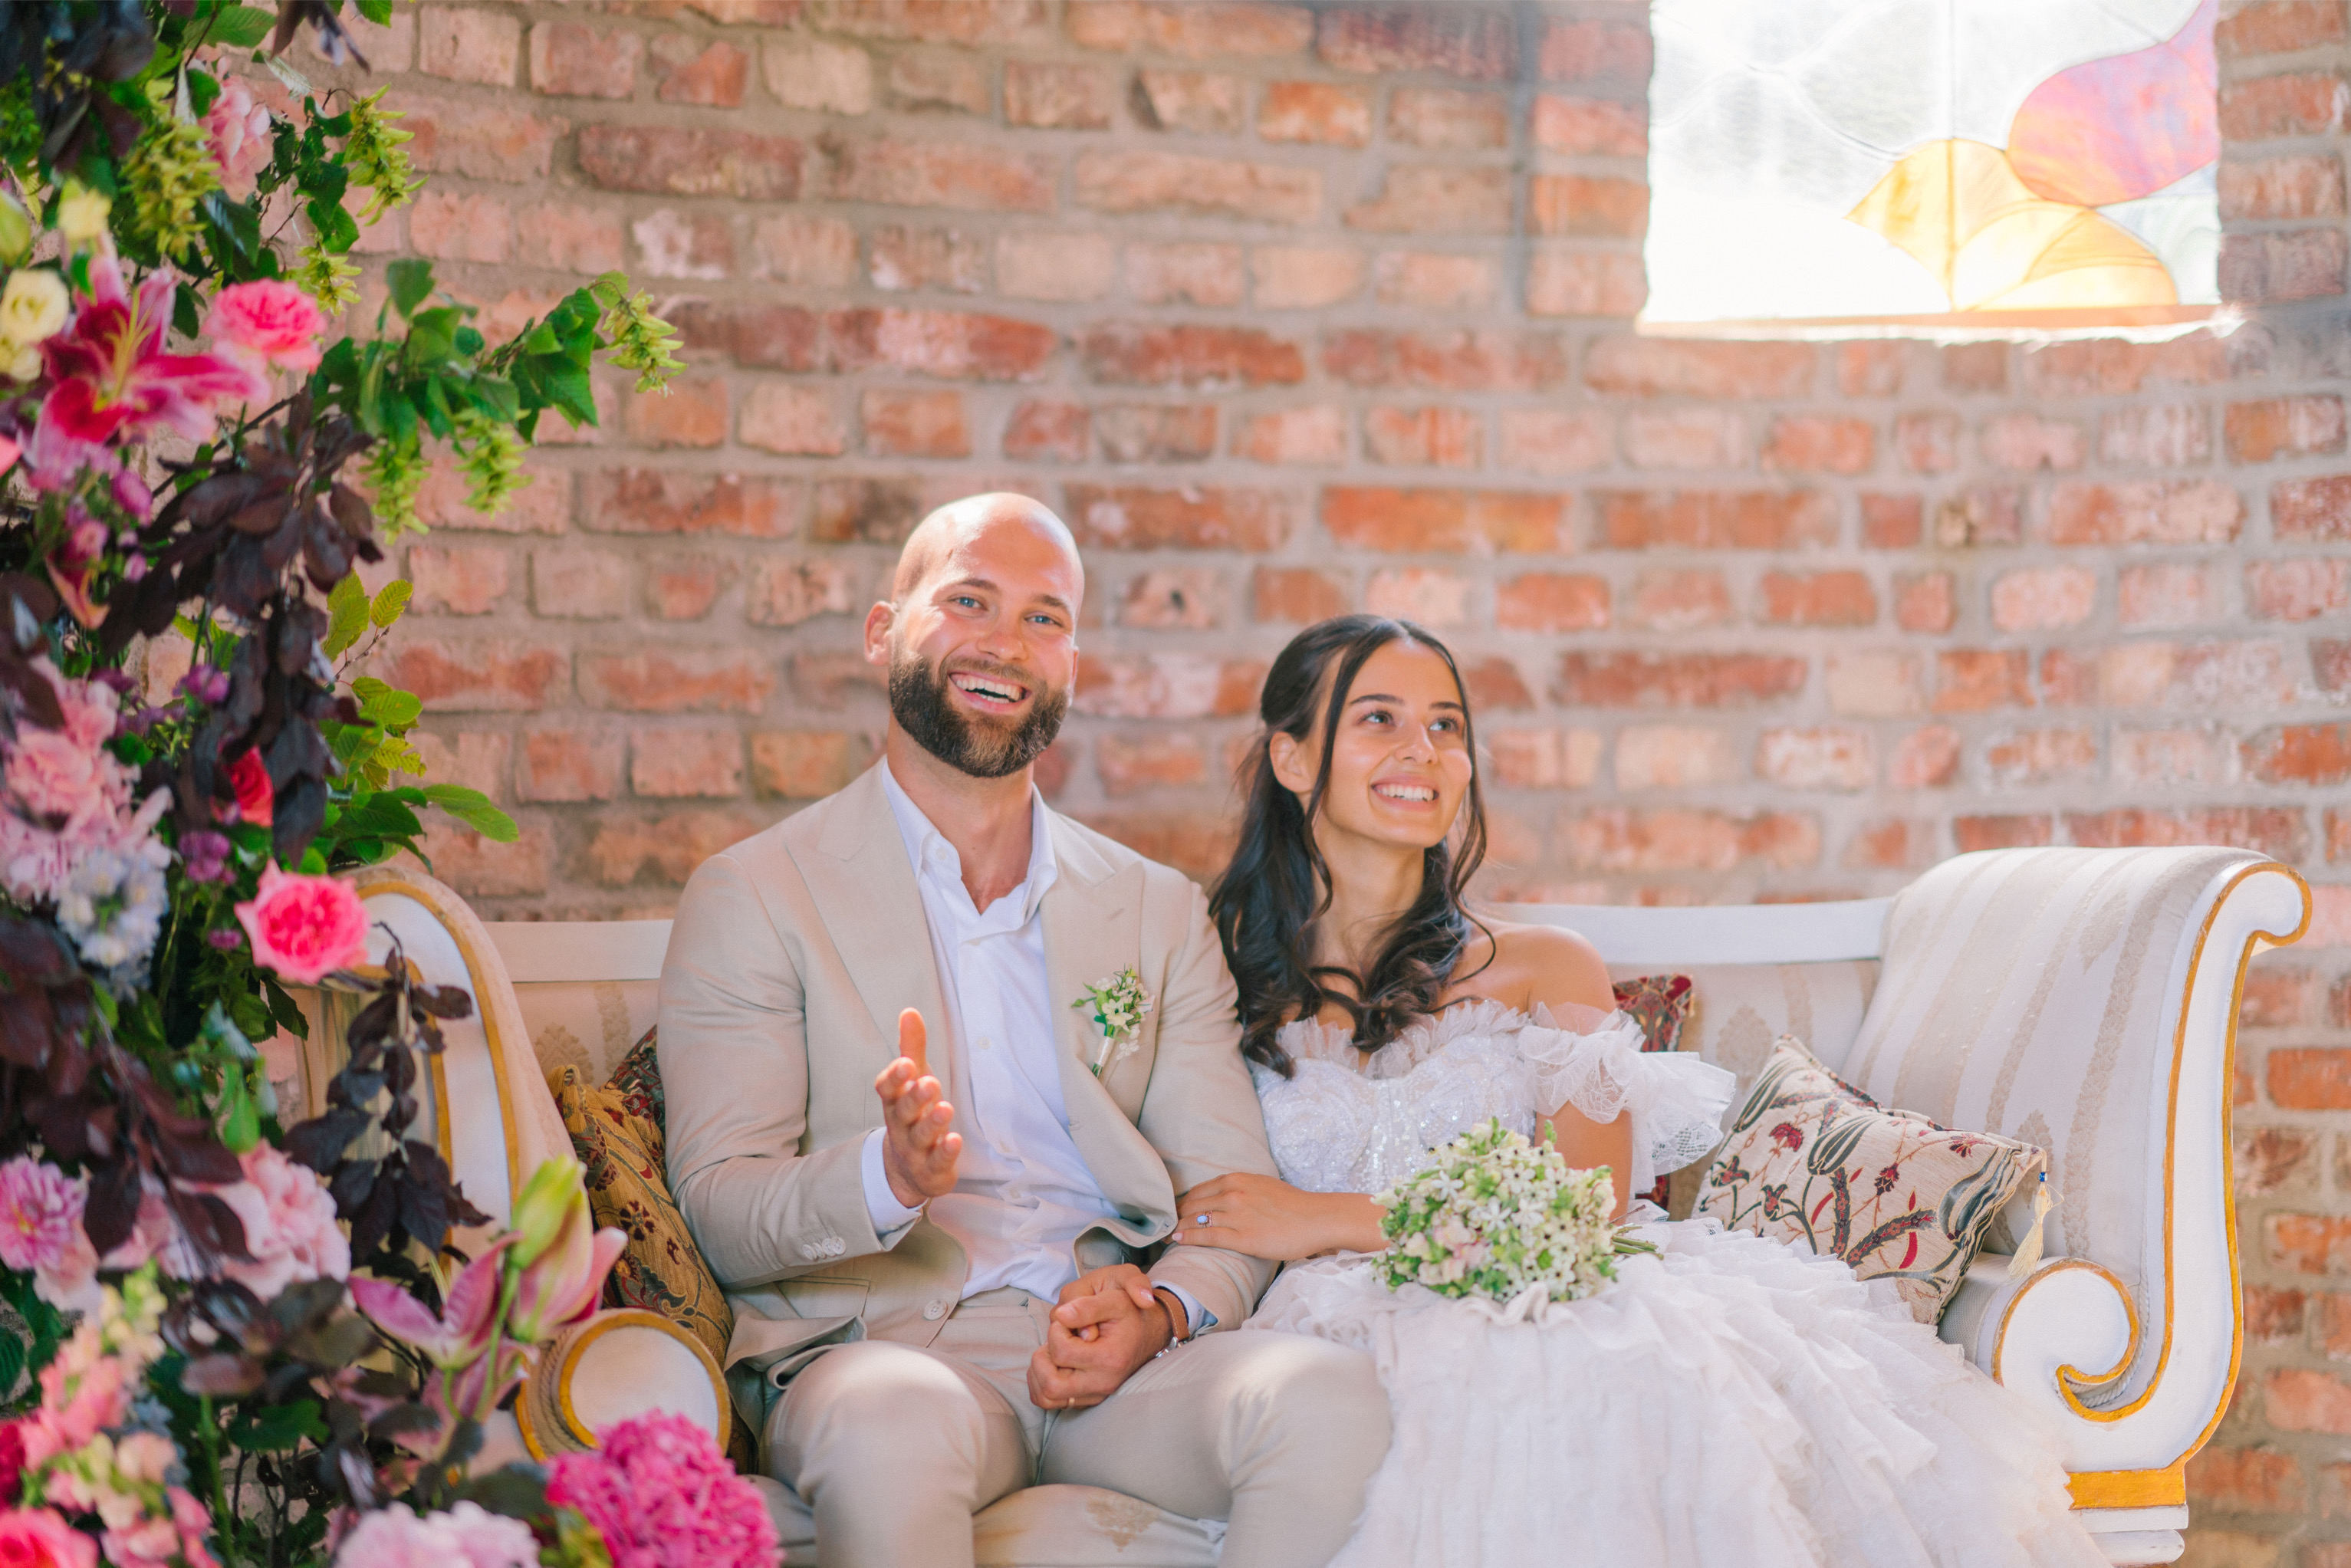 Romantic Bride and Groom Wedding Ceremony Seating